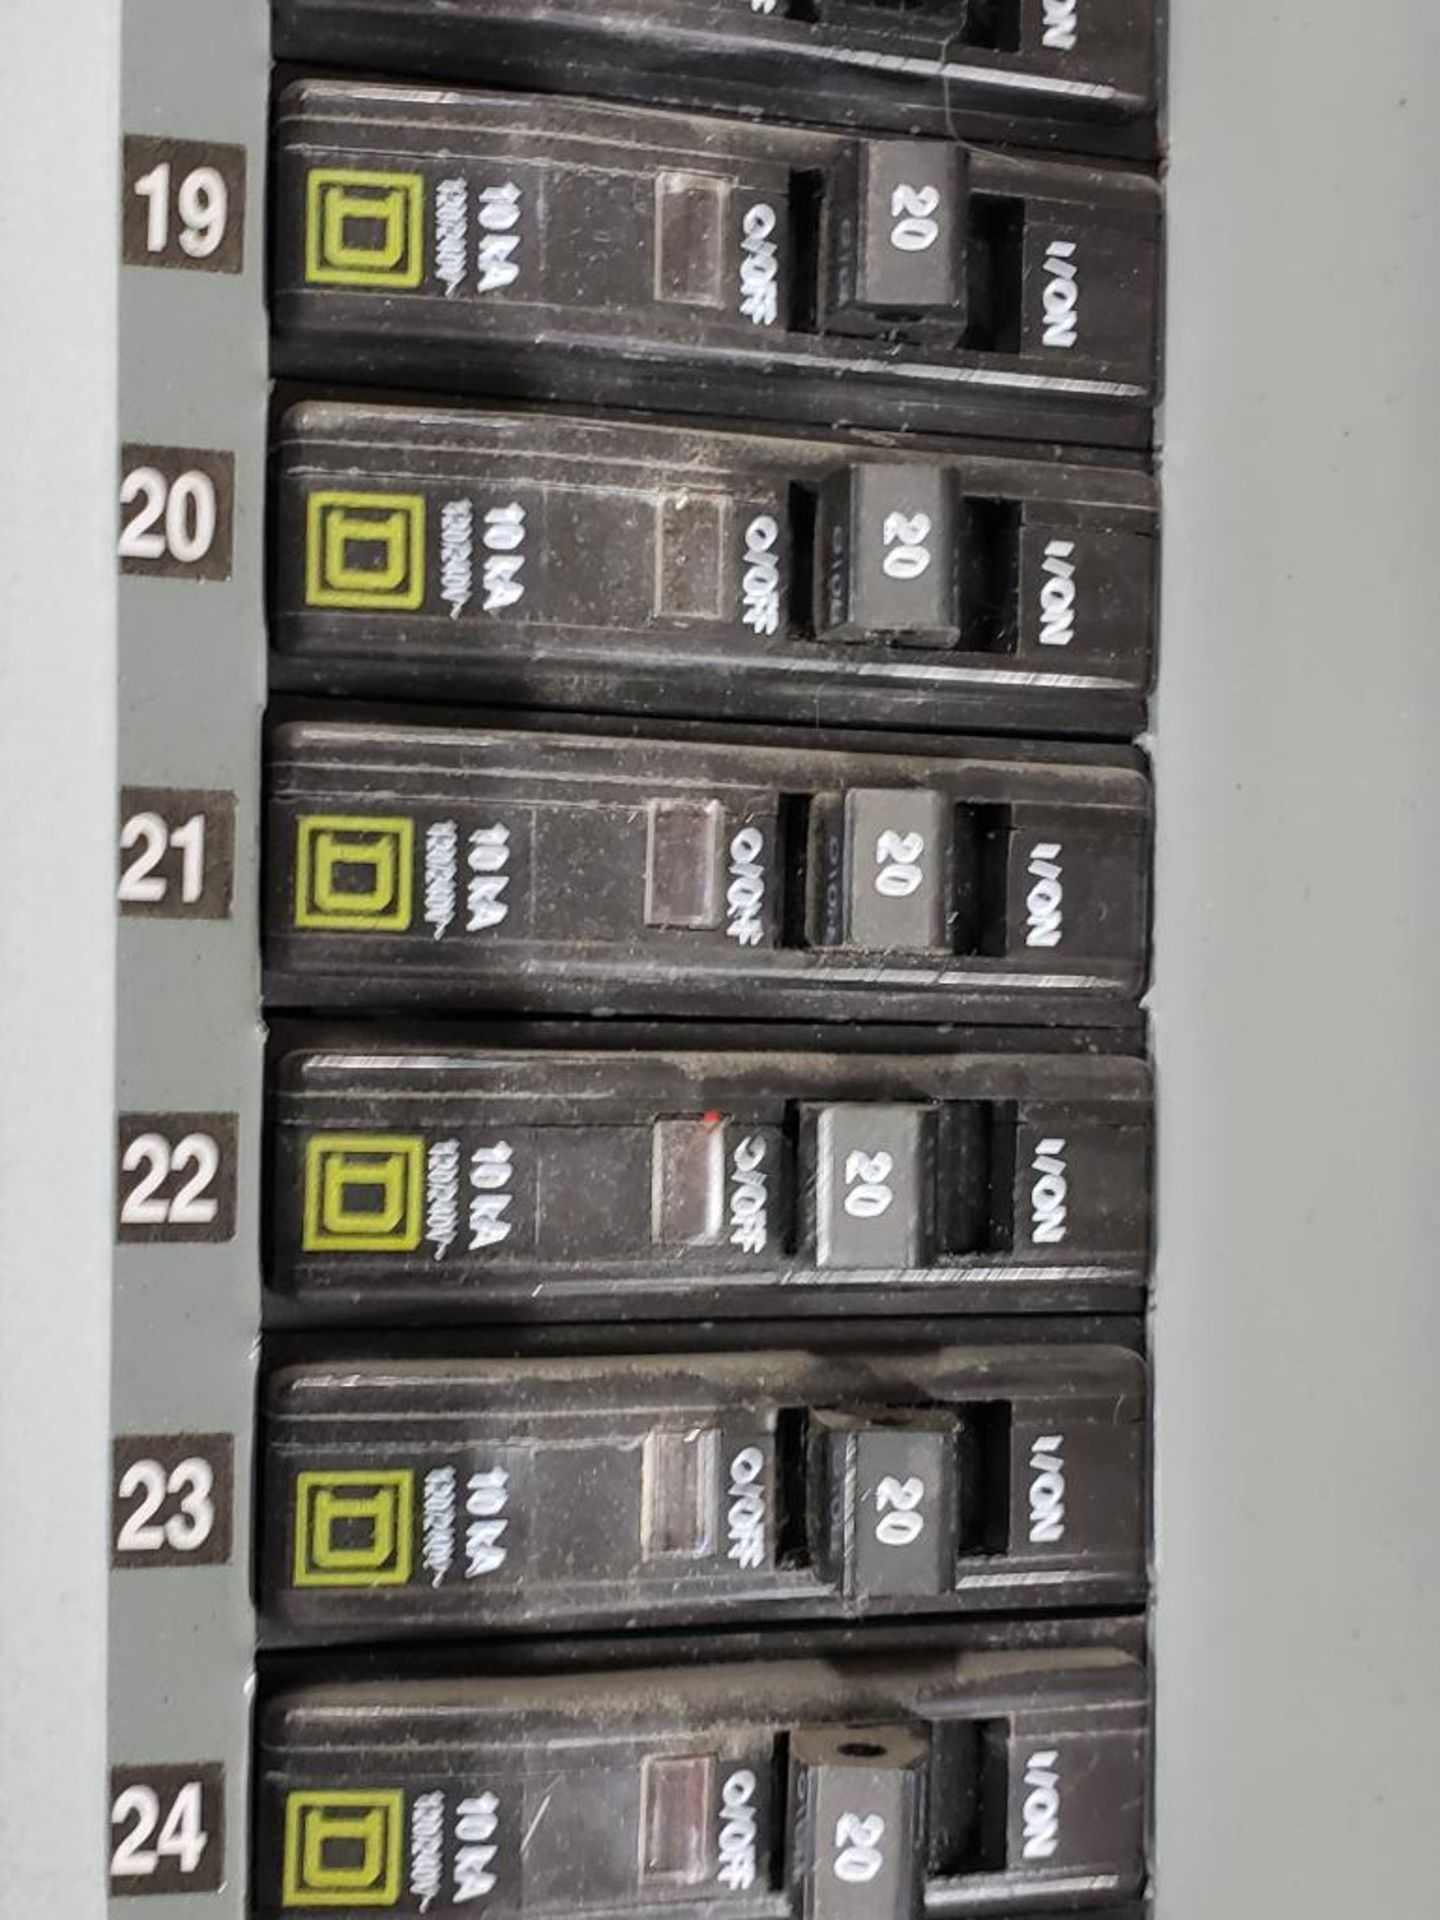 Square-D LX62TS Type-1 Enclosure. - Image 7 of 14